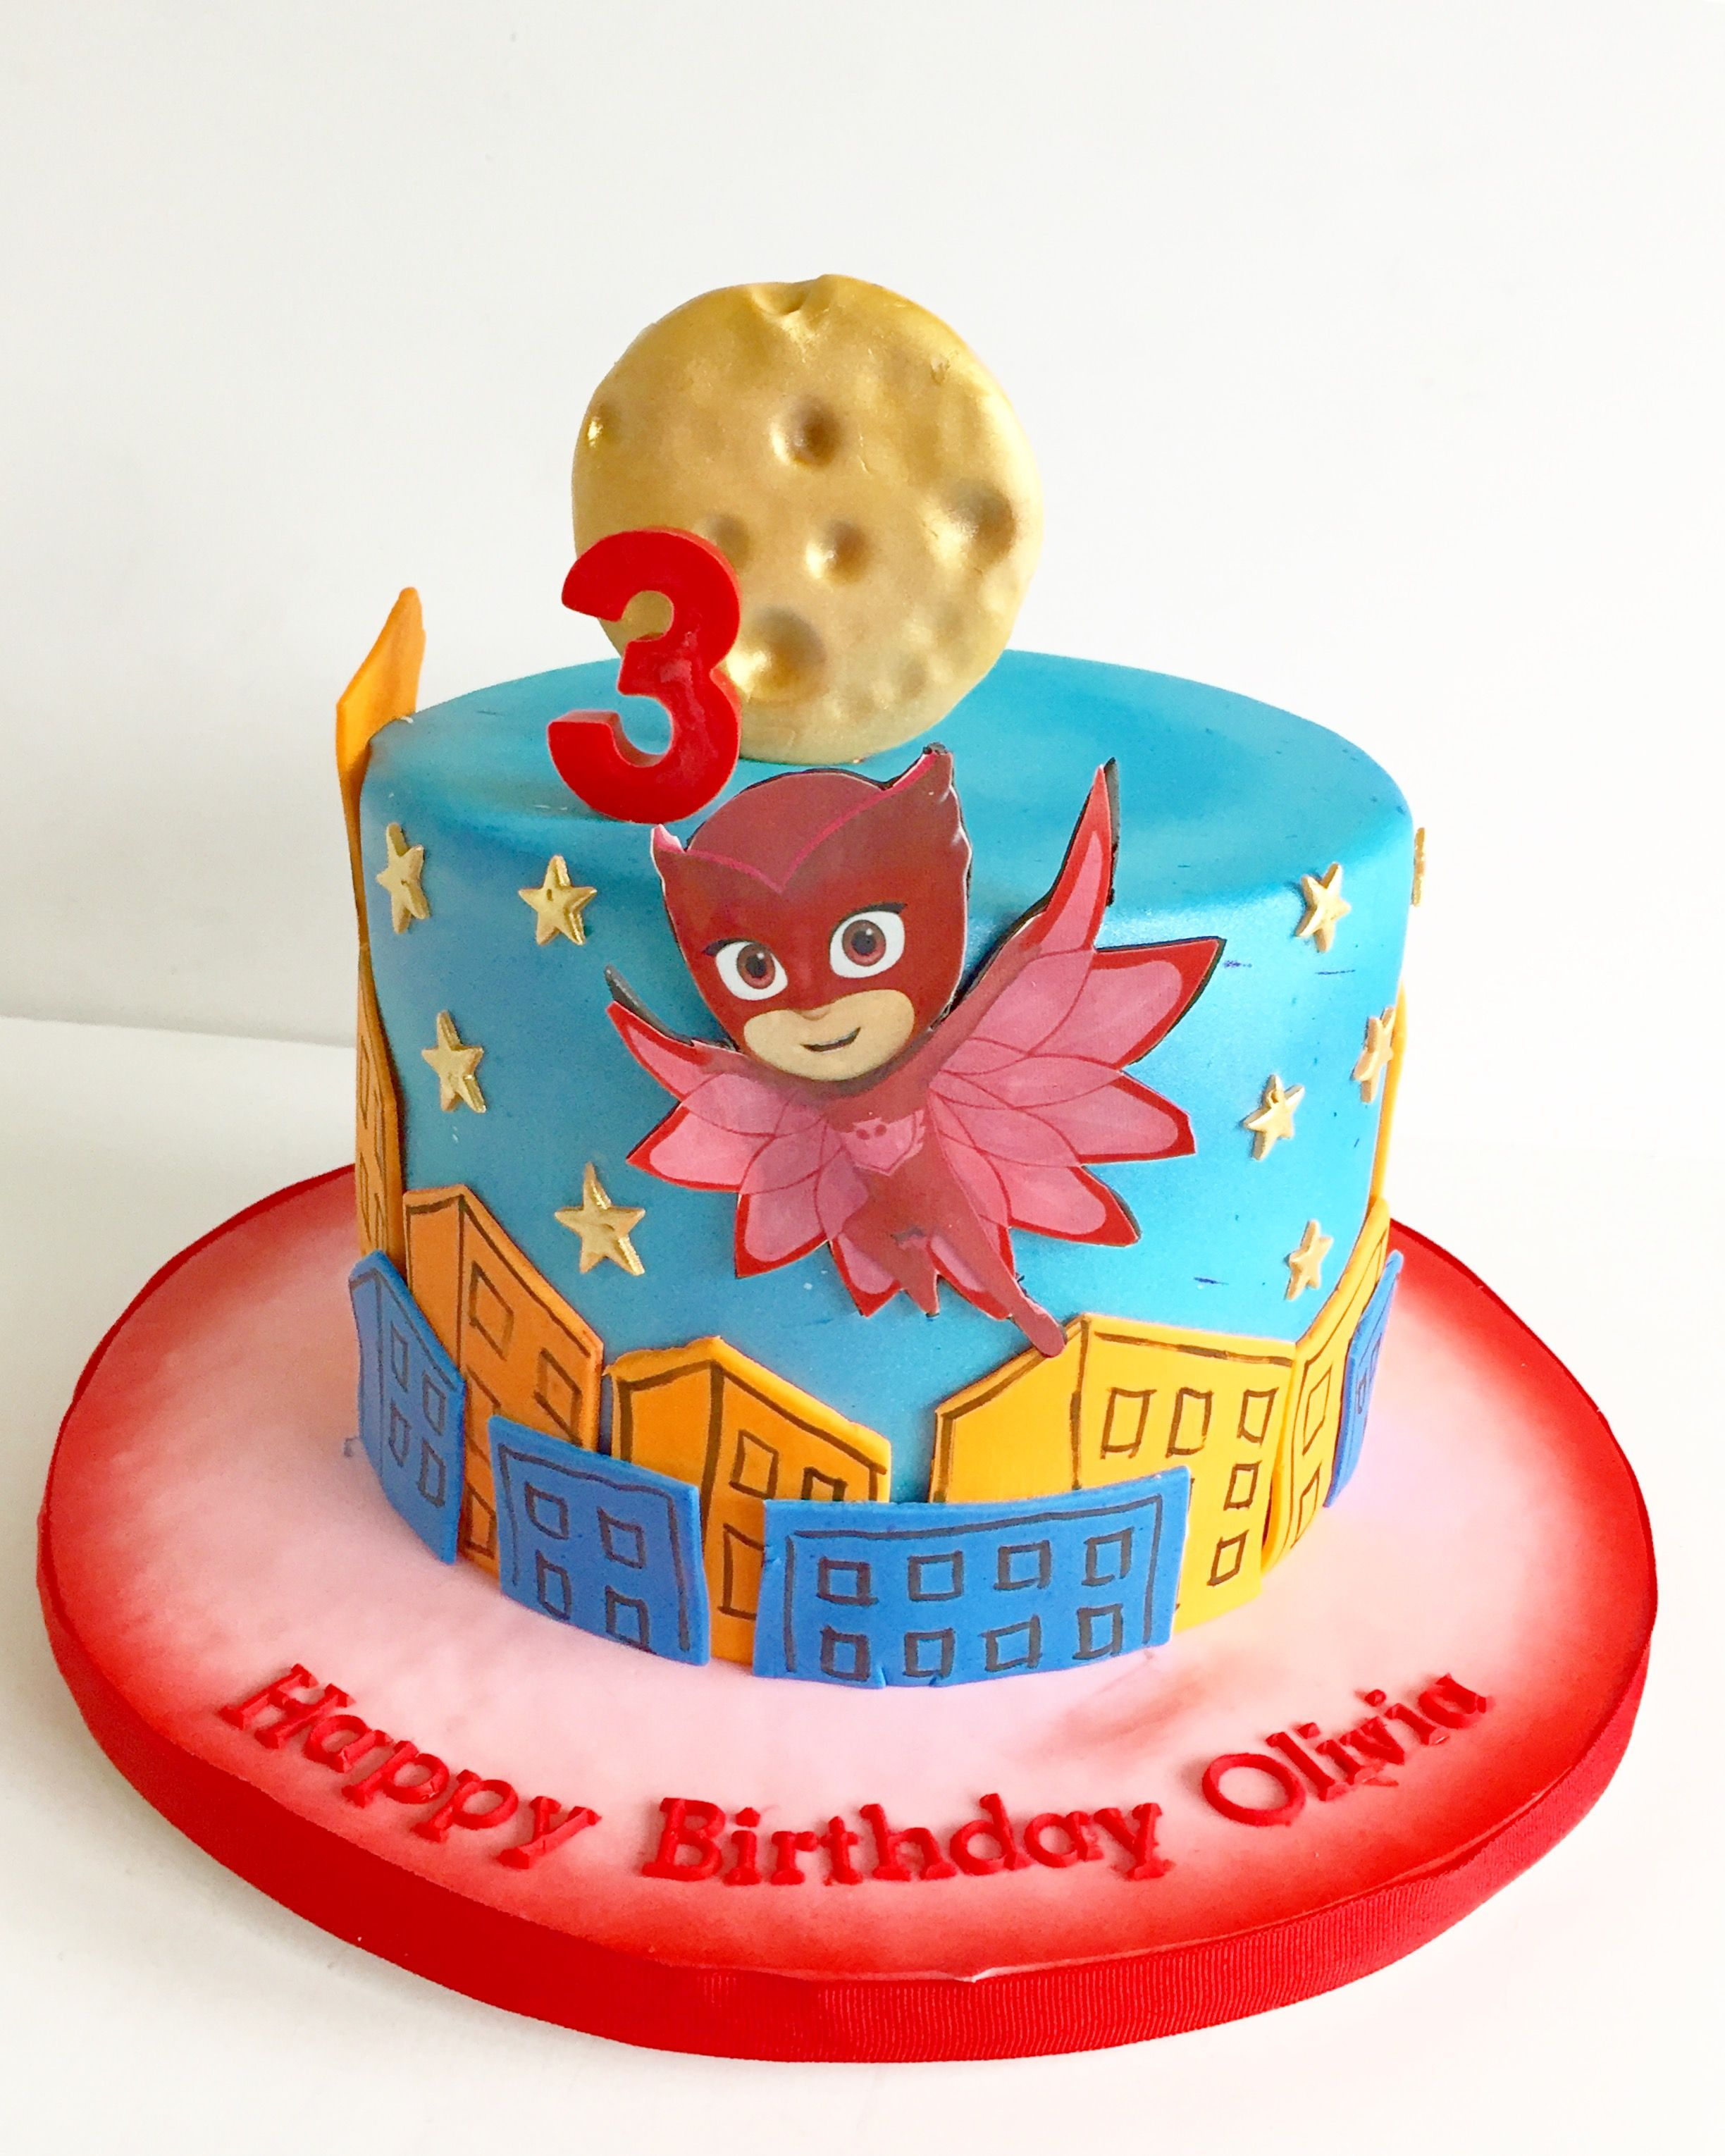 Owlette cake sanduches baby shower pasteles para ni os - Bizcocho cumpleanos para ninos ...